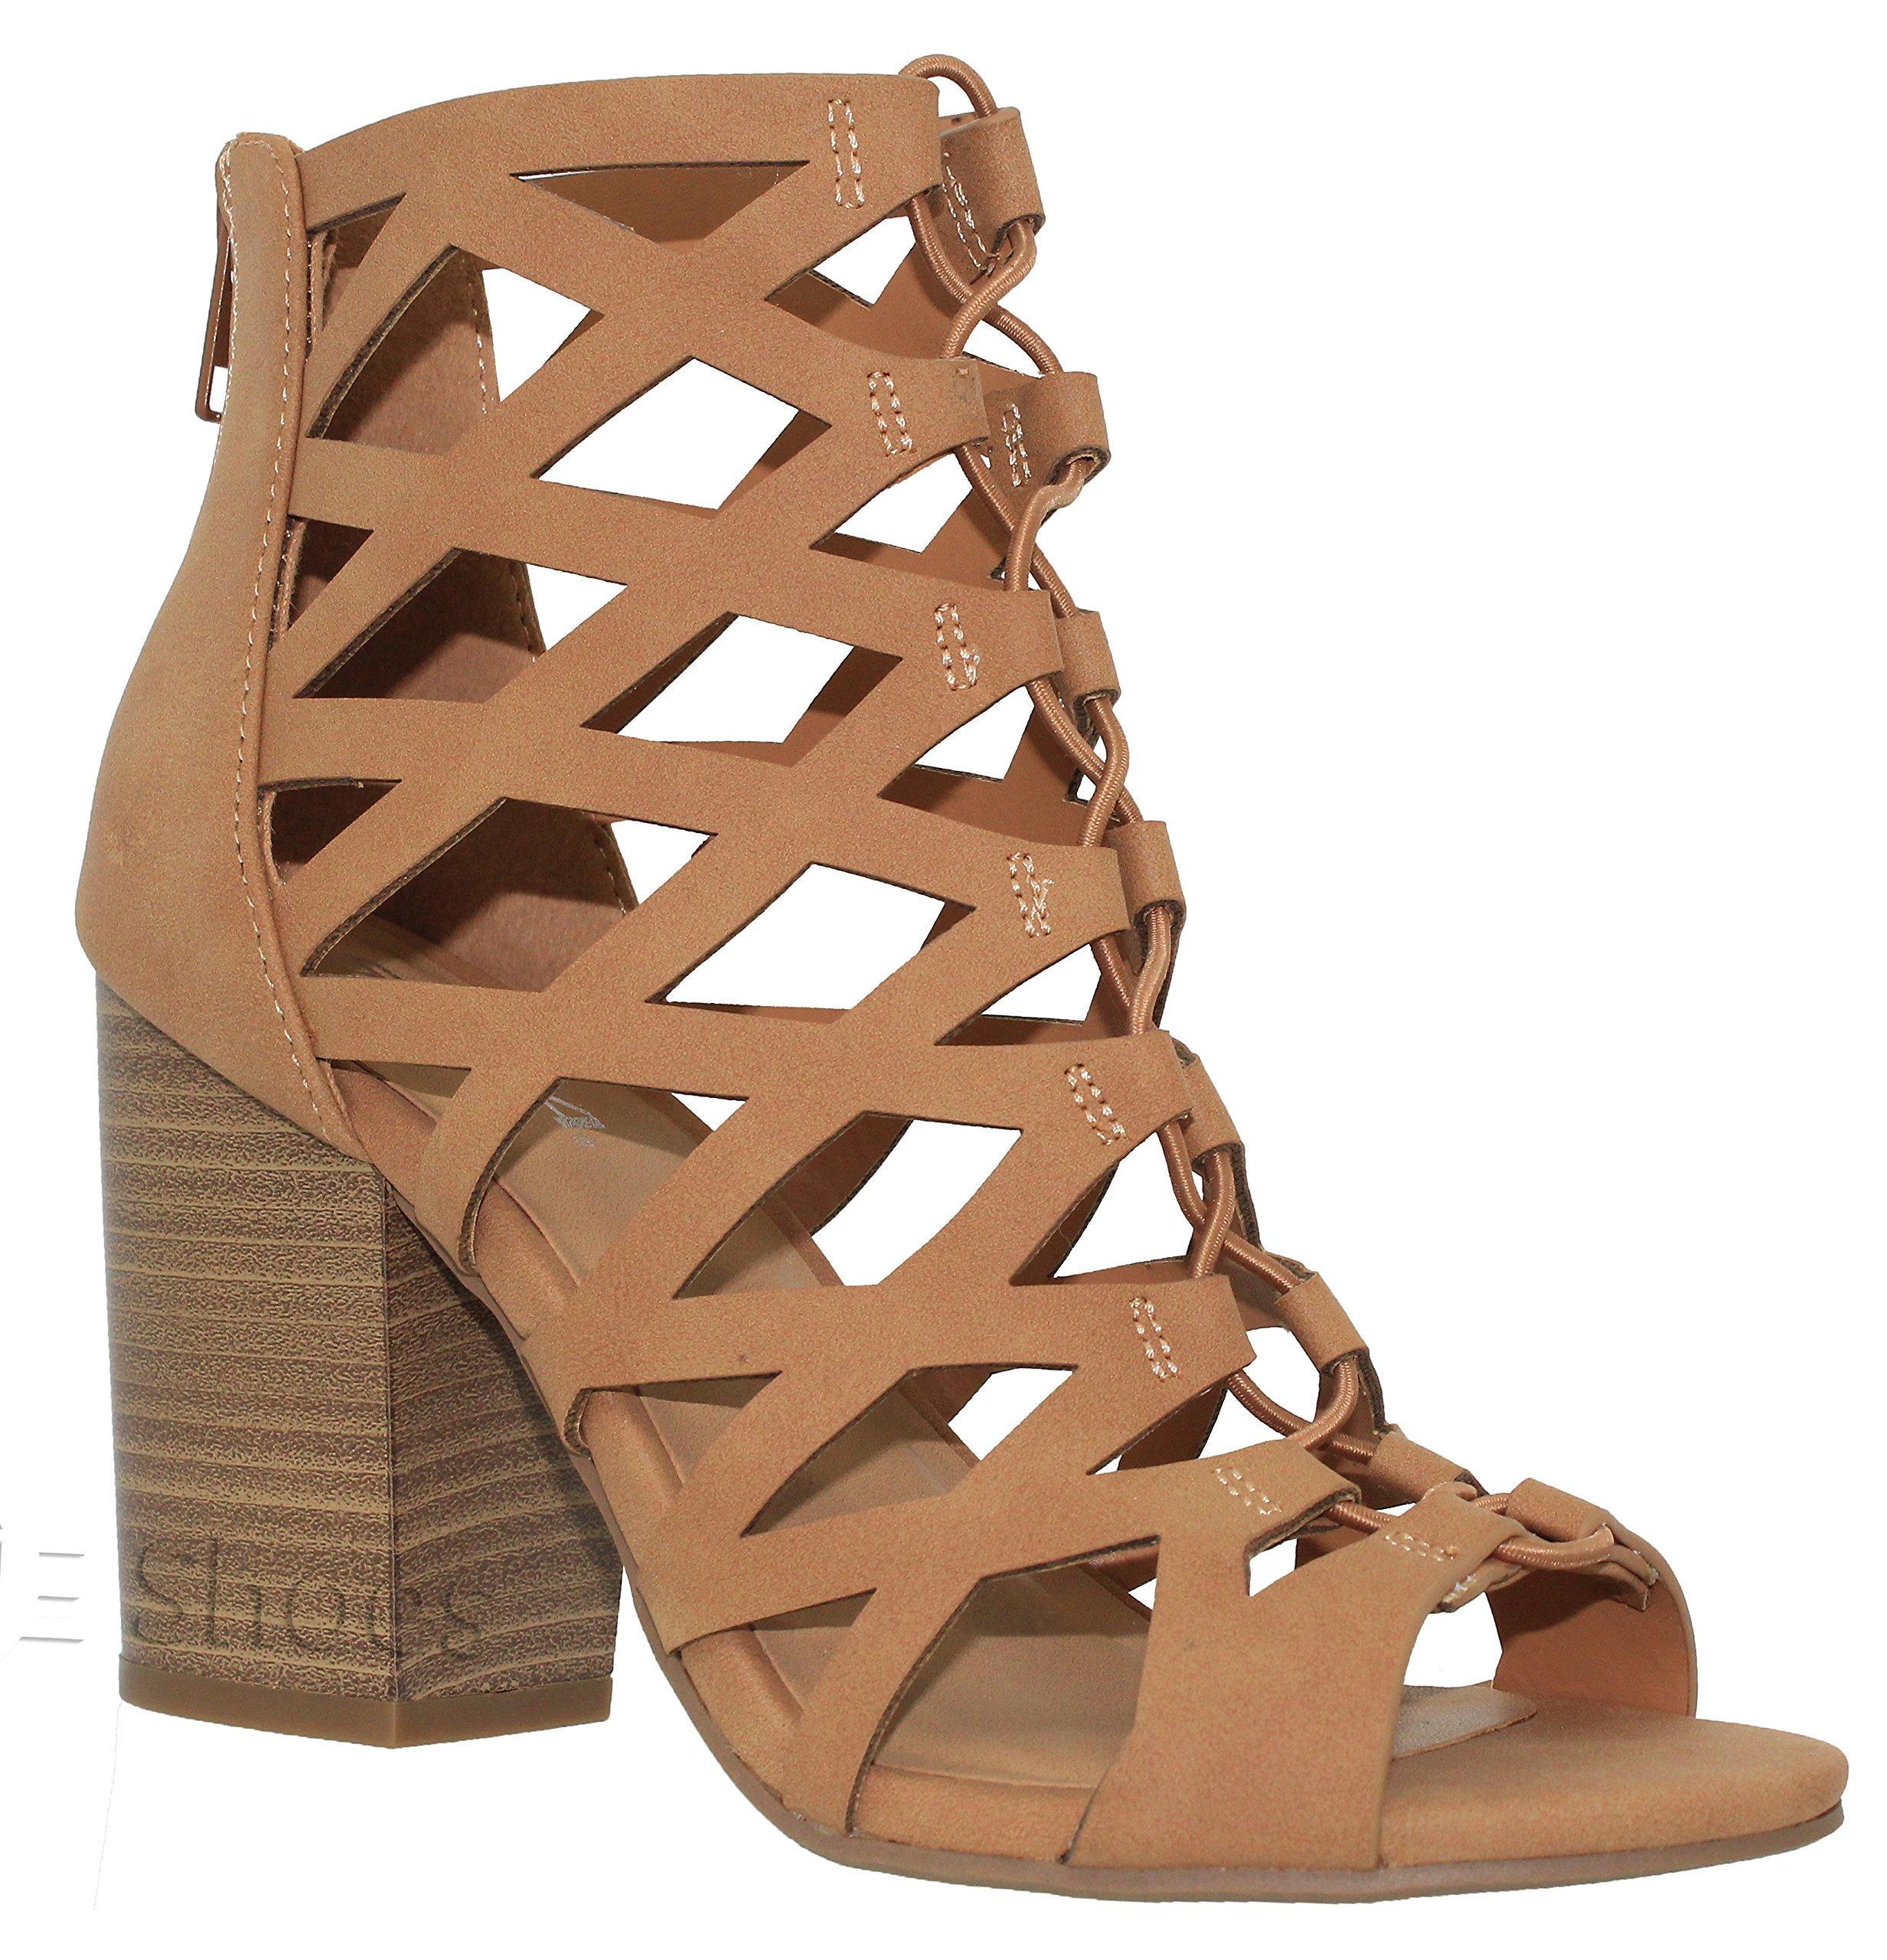 MVE Shoes Women's Open Toe Strappy Back Zipper Chunky Heel, tan nb Size 10 by MVE Shoes (Image #7)